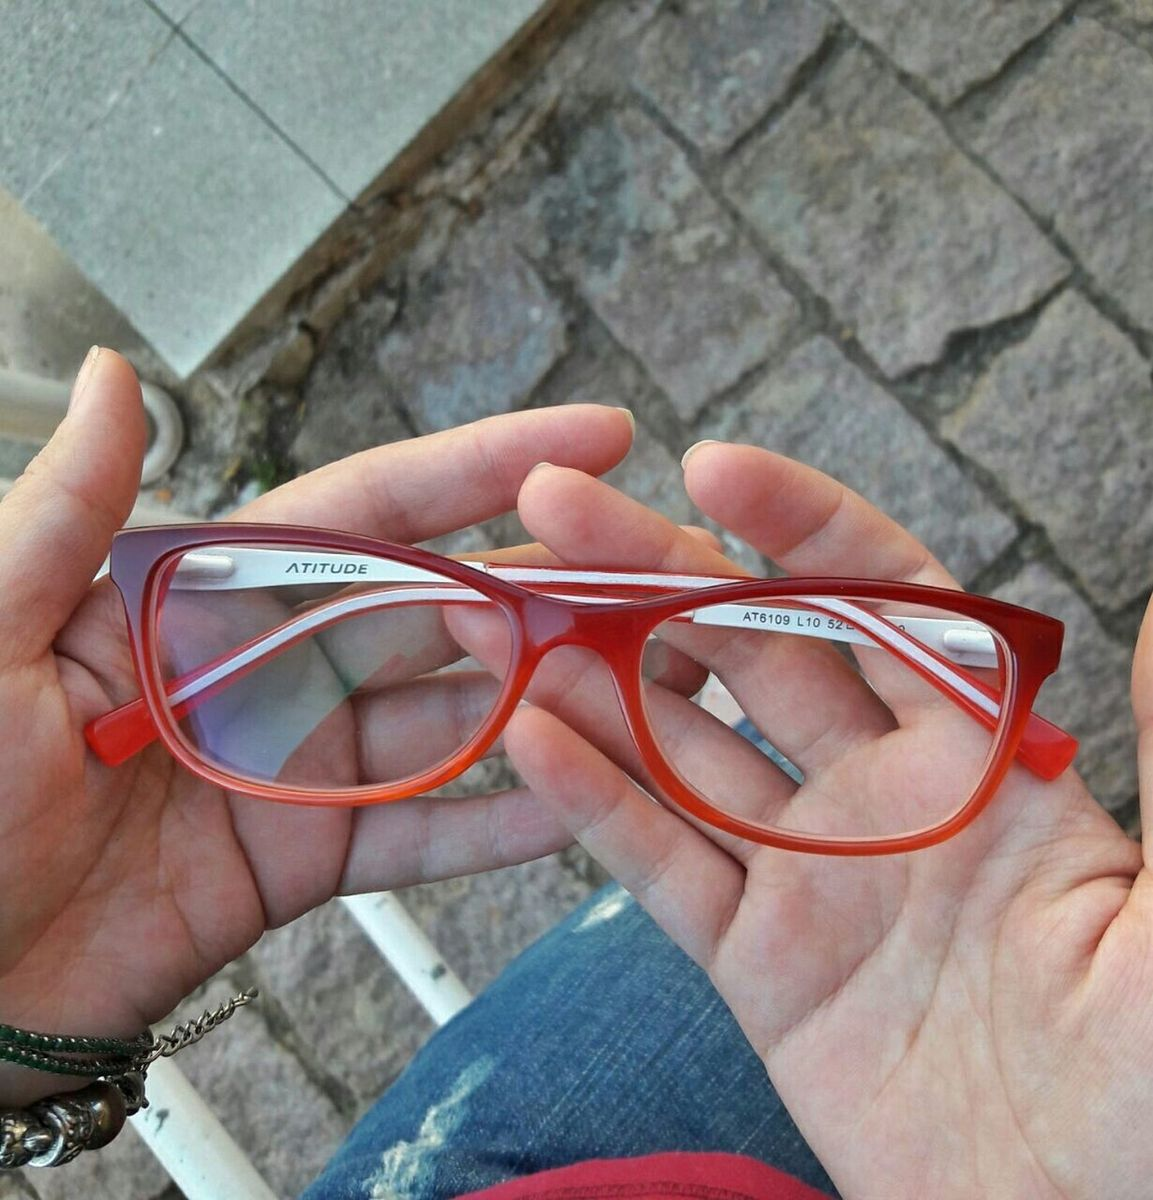 d7946720064f2 armação de óculos vermelha - óculos atitude.  Czm6ly9wag90b3muzw5qb2vplmnvbs5ici9wcm9kdwn0cy81mzqwmzq3lzi4zgmxmzg5mjk2zjq2mjyzyjuzndllm2flnwvkm2i3lmpwzw  ...